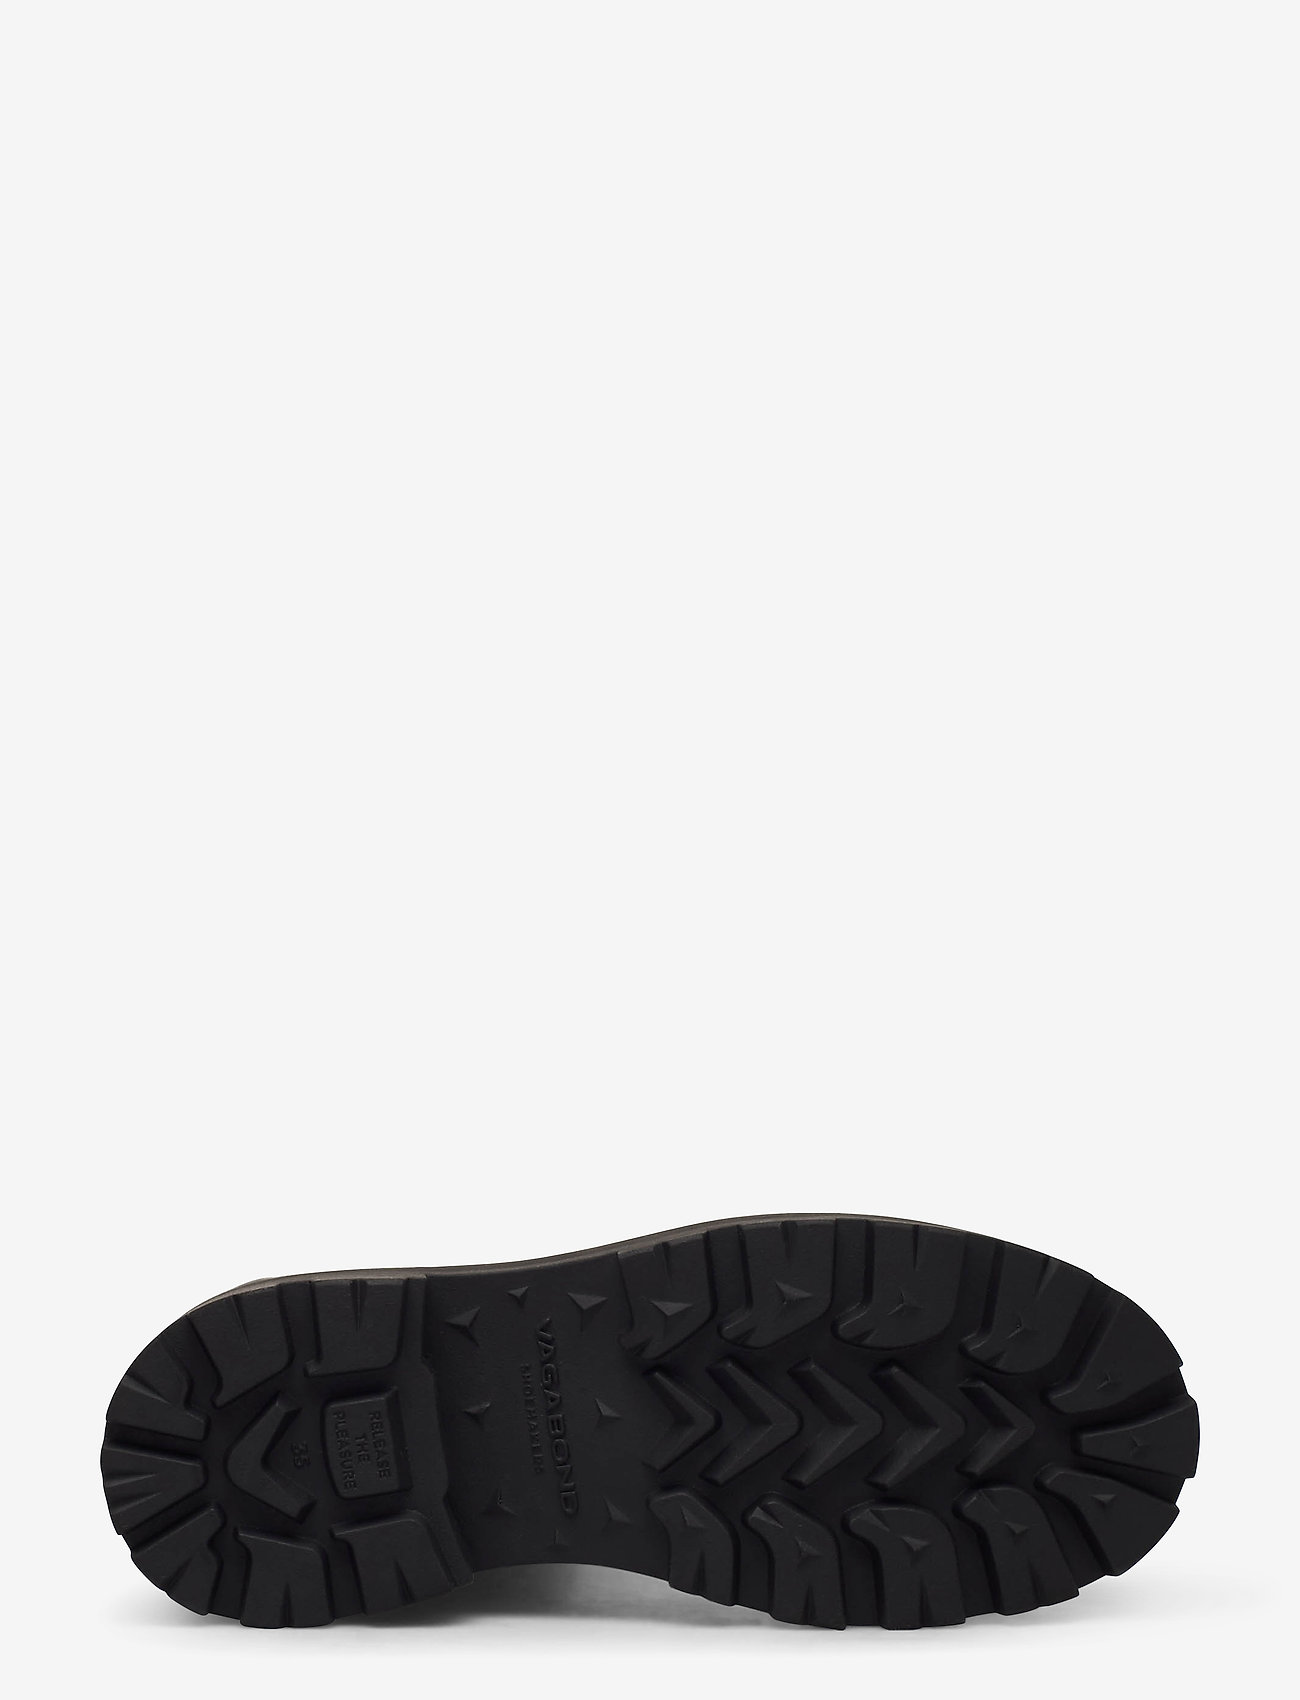 VAGABOND - COSMO 2.0 - chelsea boots - black - 4